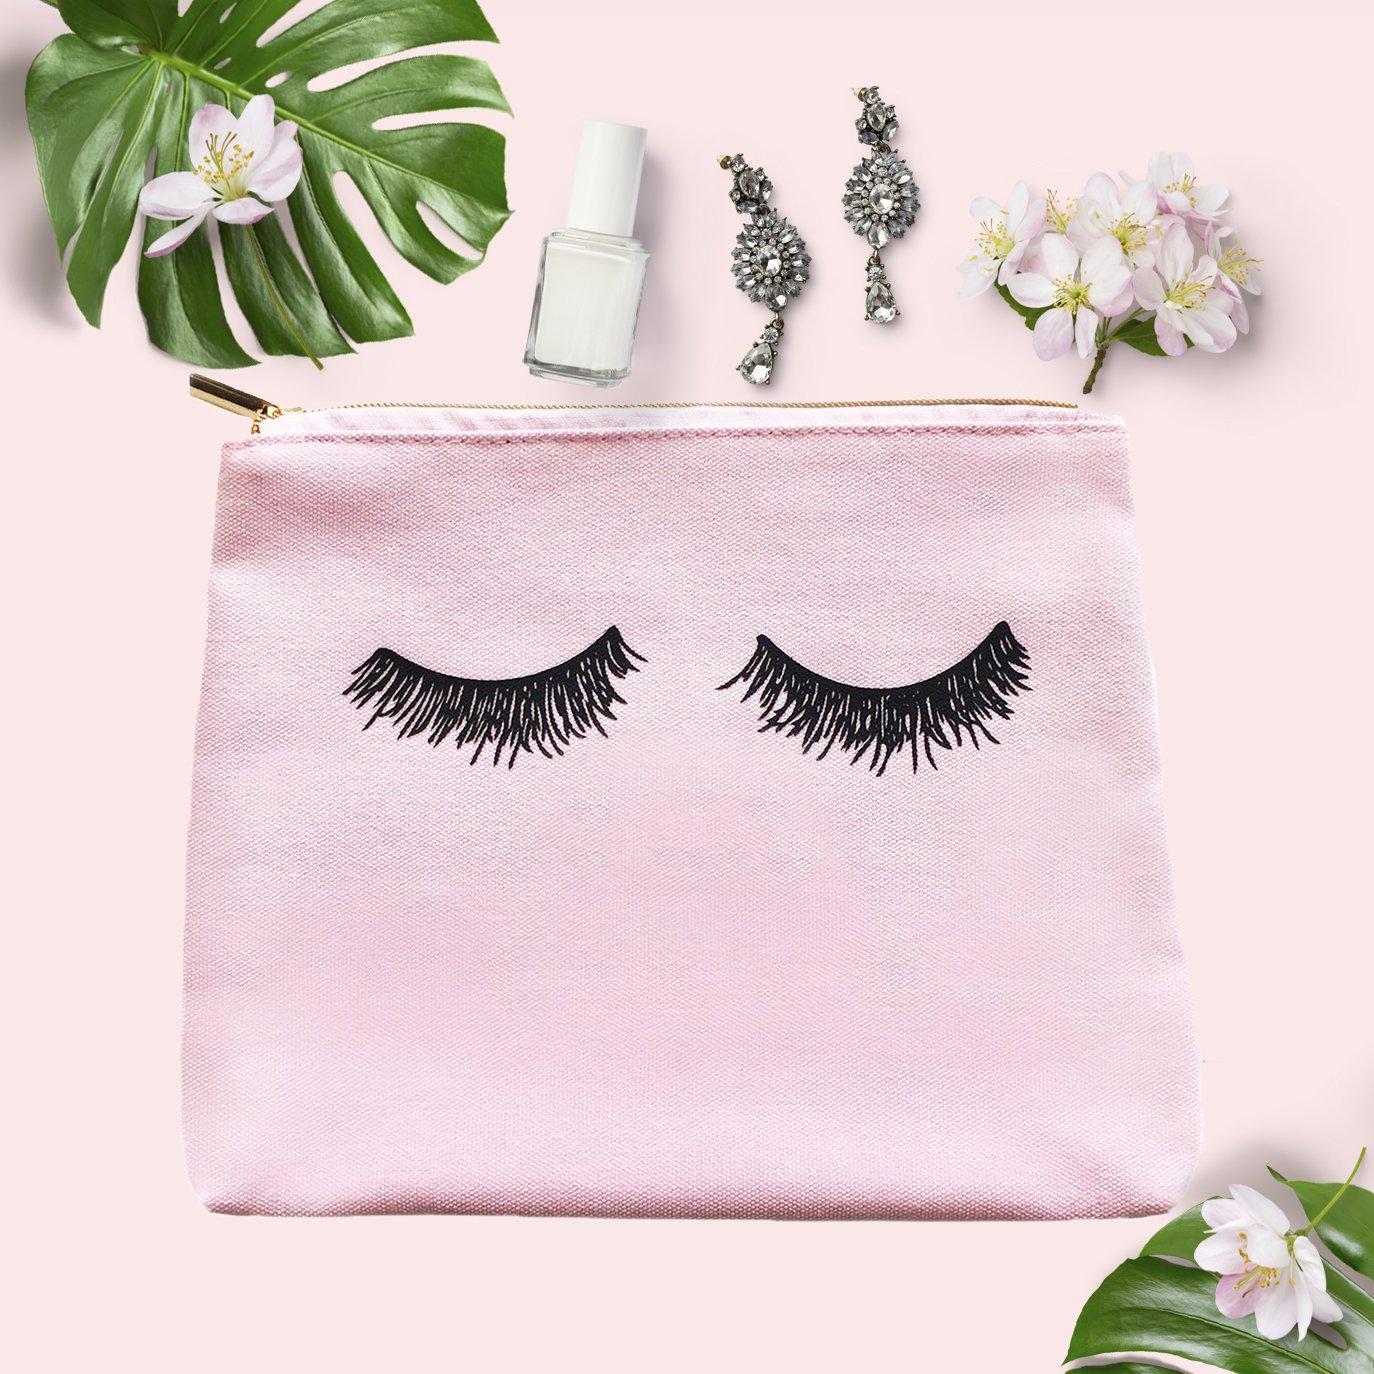 Amazon.com   Pink Eyelashes Makeup Bag   Make Up Bag Toiletry Bag Pencil  Case Travel Organizer Cosmetic Bag Bridesmaid Gift for Her Canvas Bride Gift    ... a13af4113e